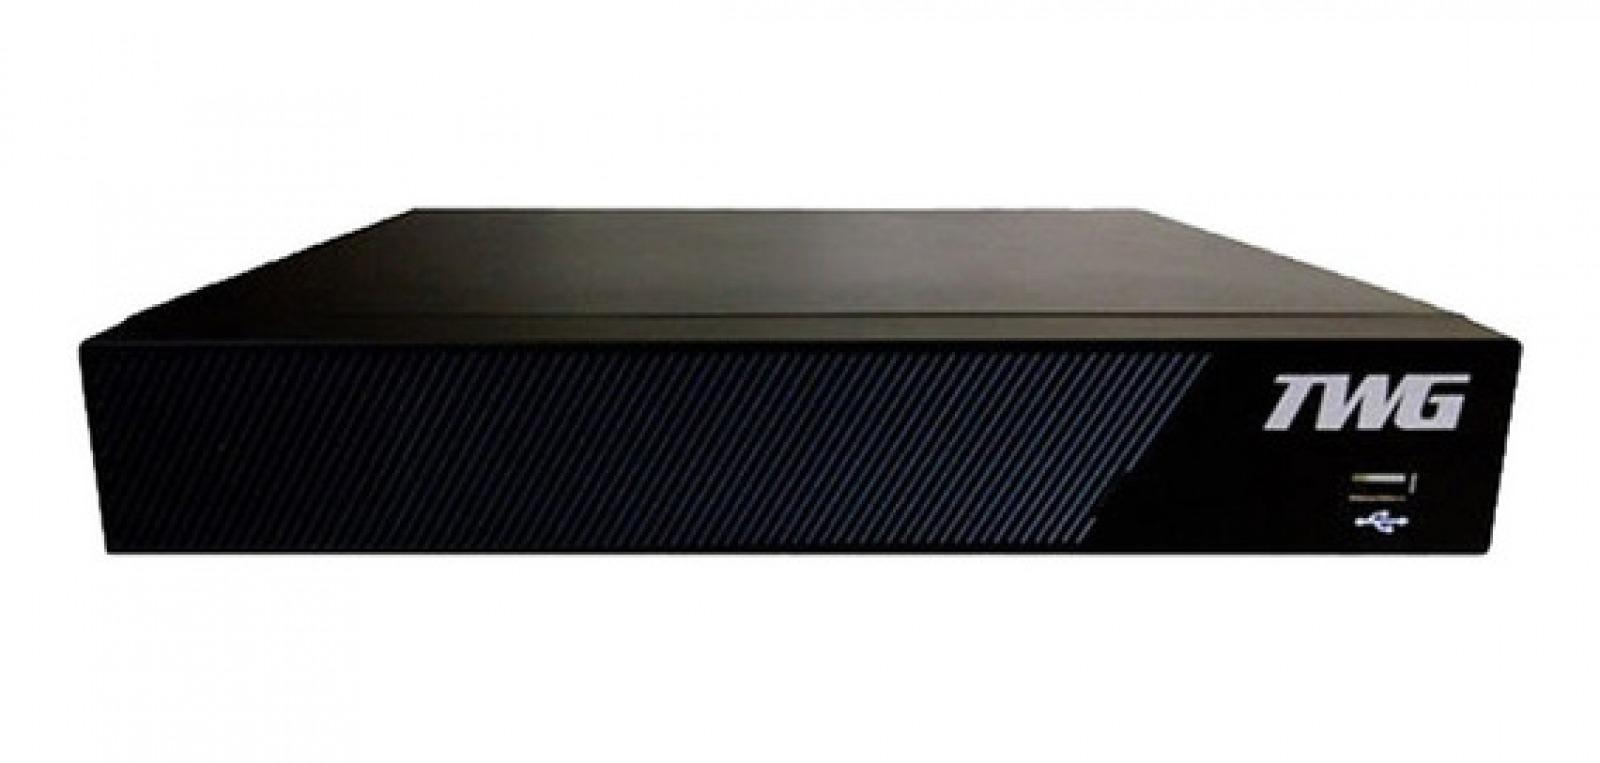 DVR 8 CANAIS TWG 6X1 5MP DETECT